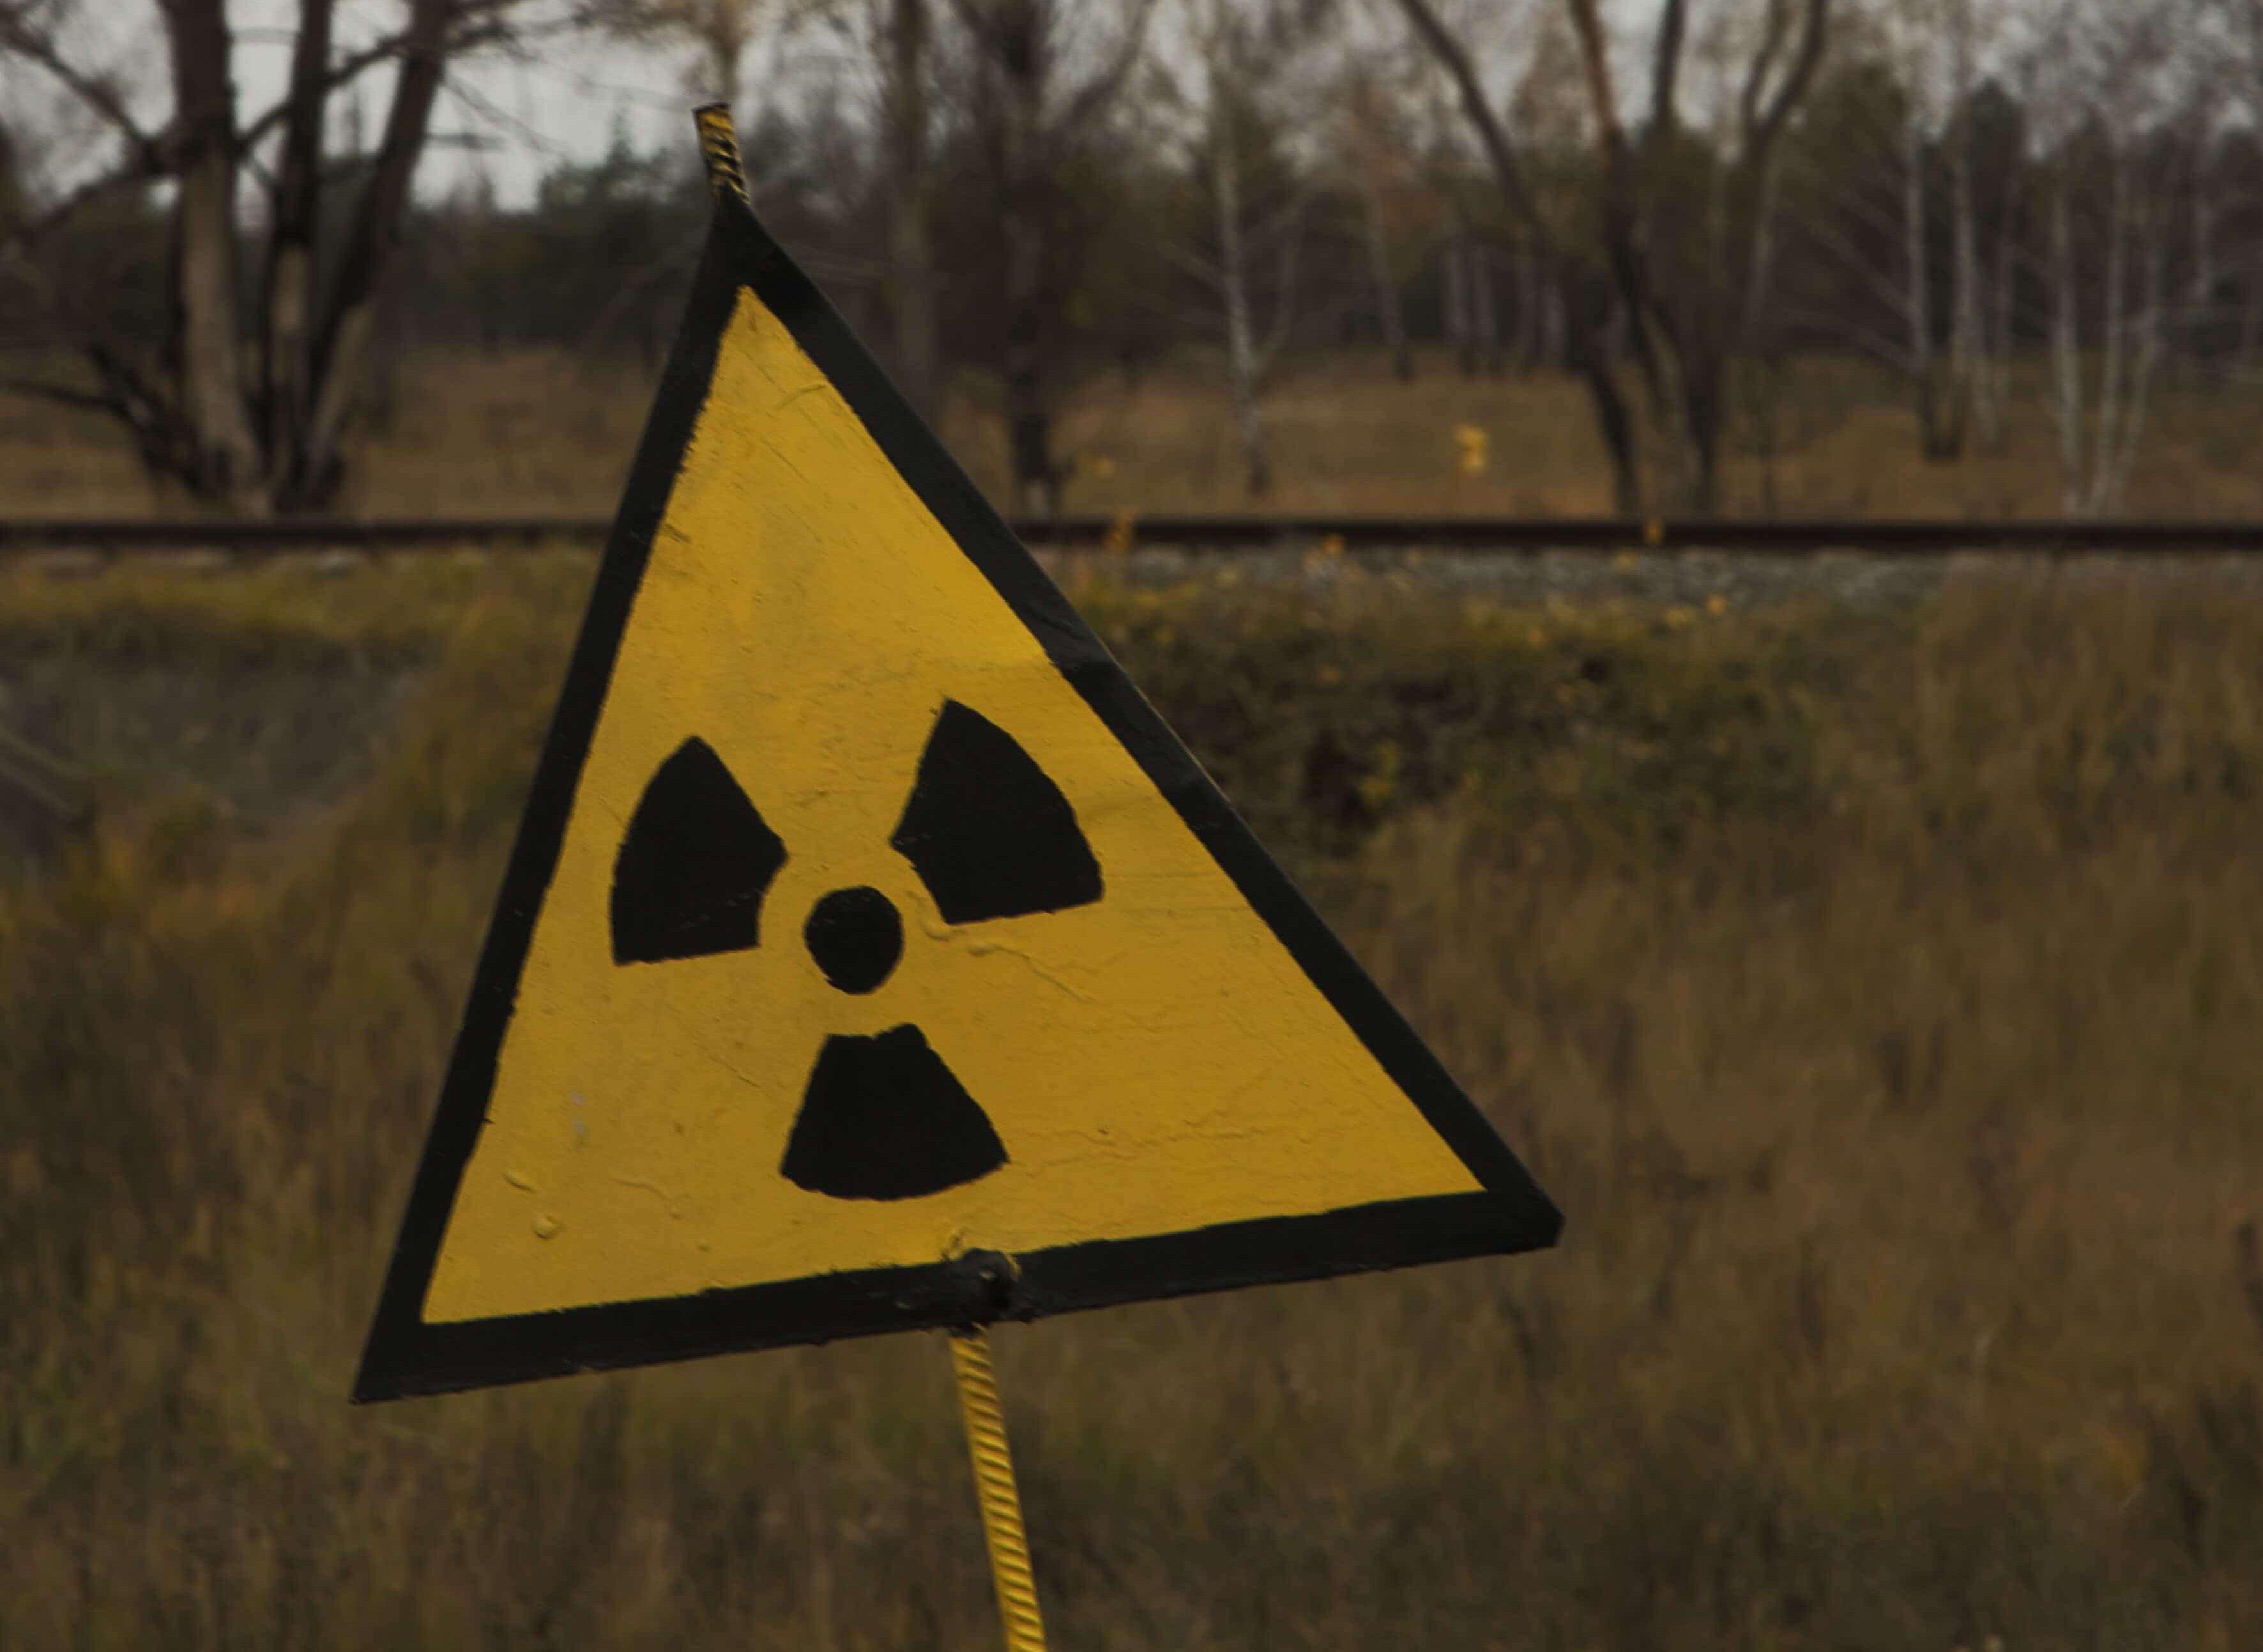 señal de peligro por contaminación